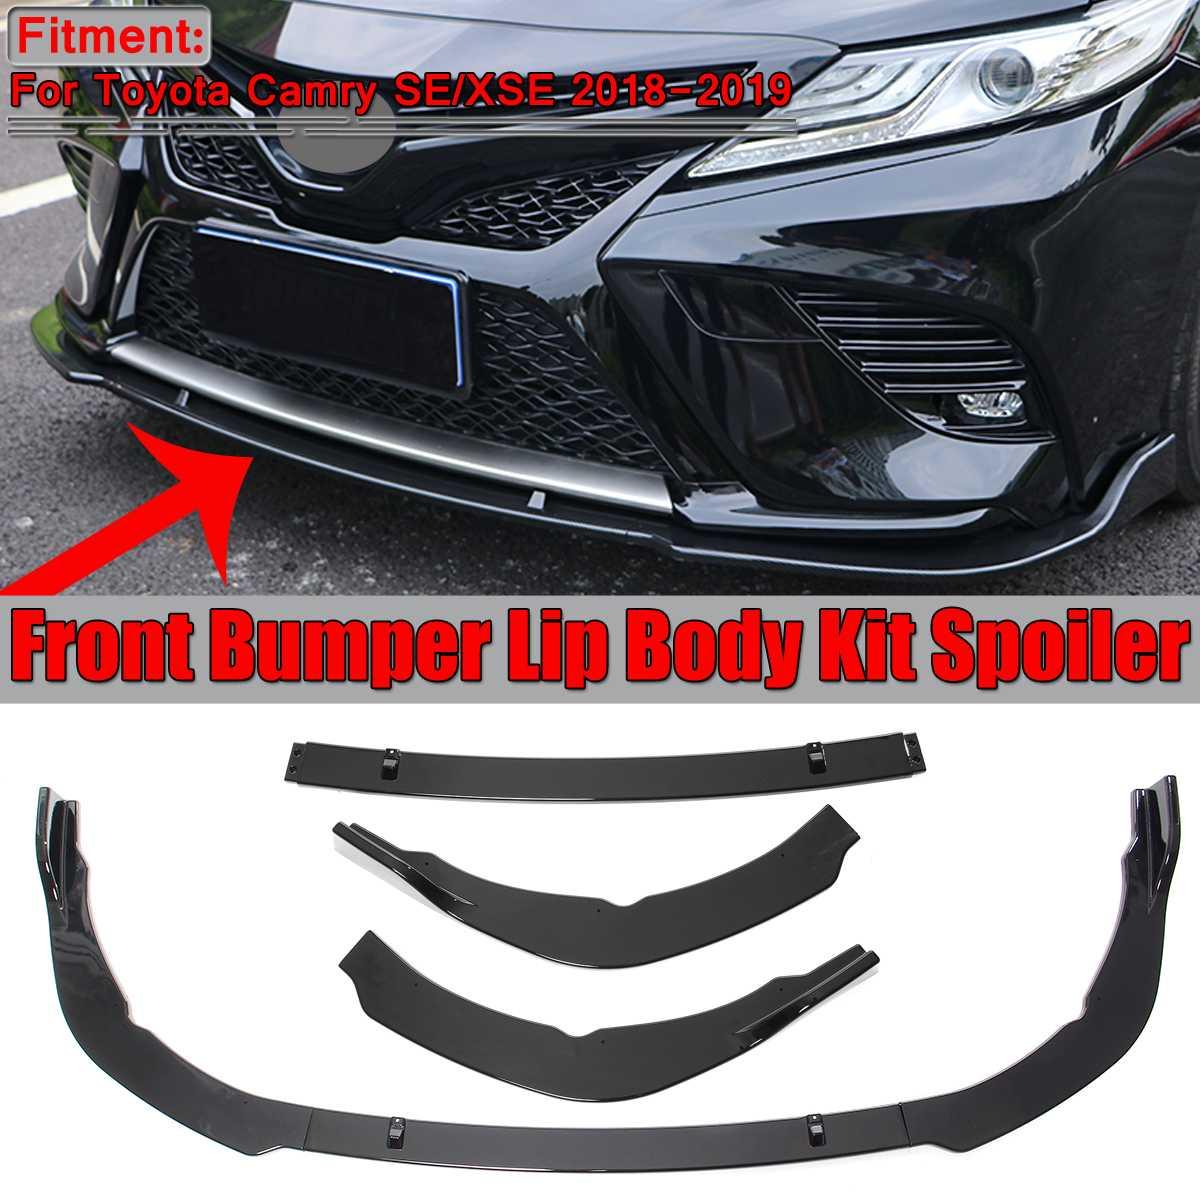 3Pcs Front Bumper Lip Body Kit Lower Spoiler For Toyota Camry SE XSE 2018-2019